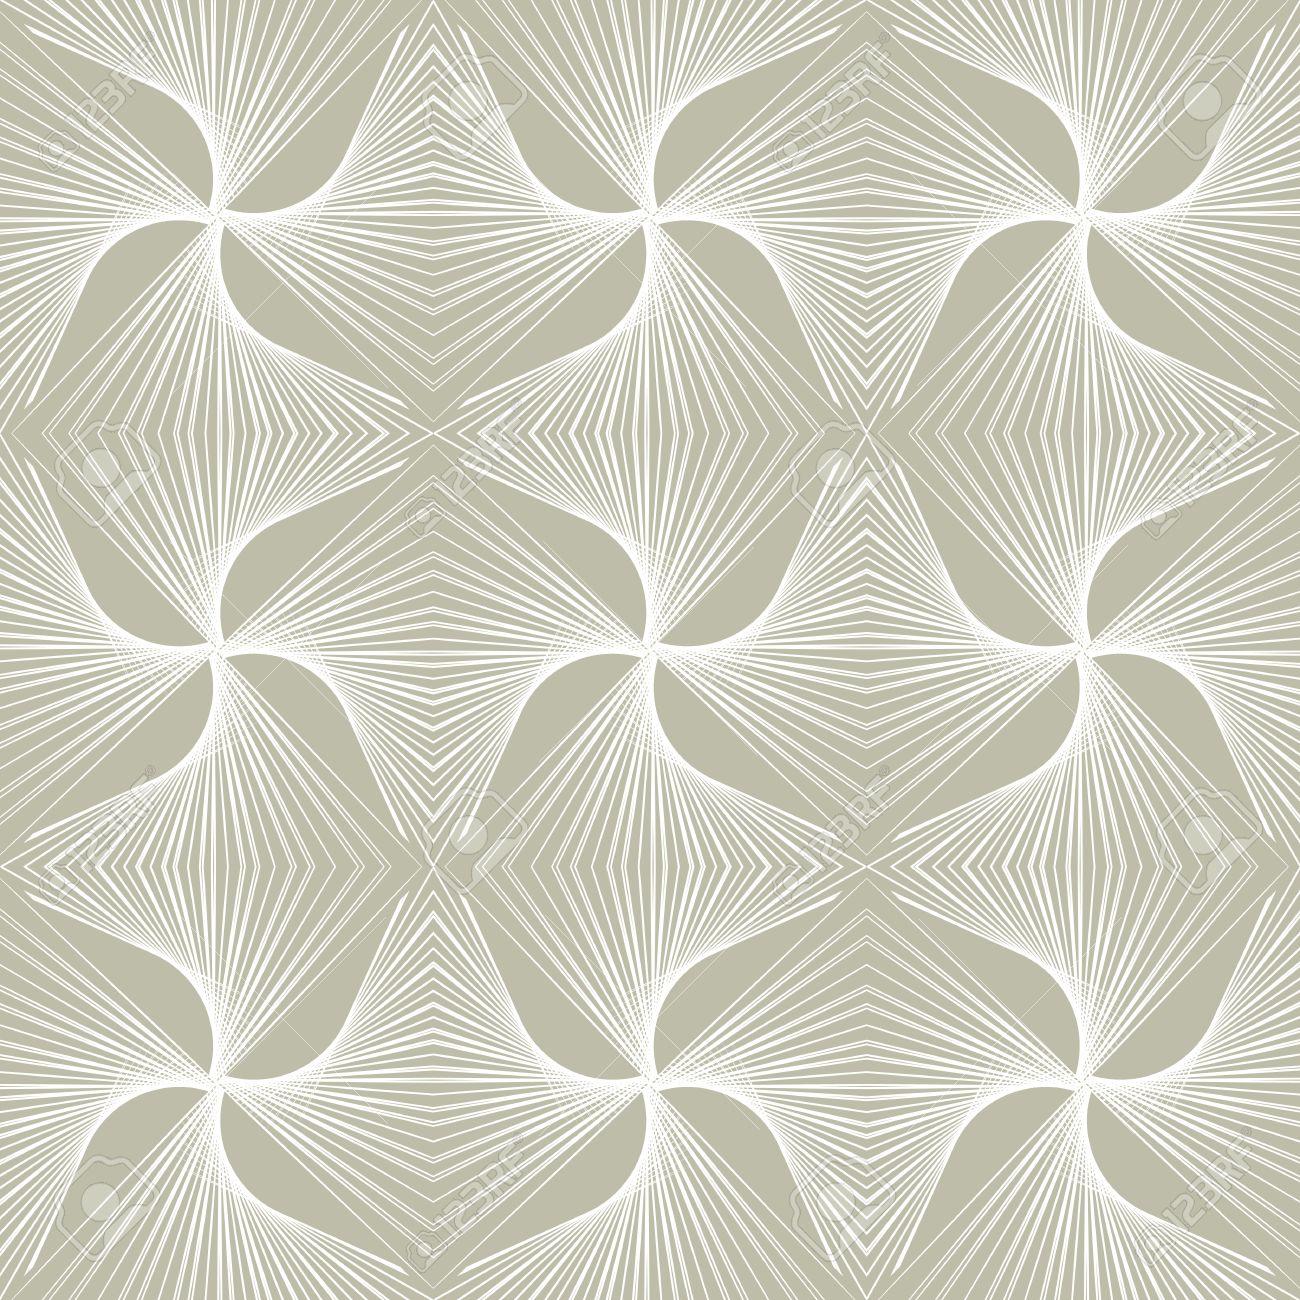 1930s geometric art deco modern pattern Stock Vector - 17147262